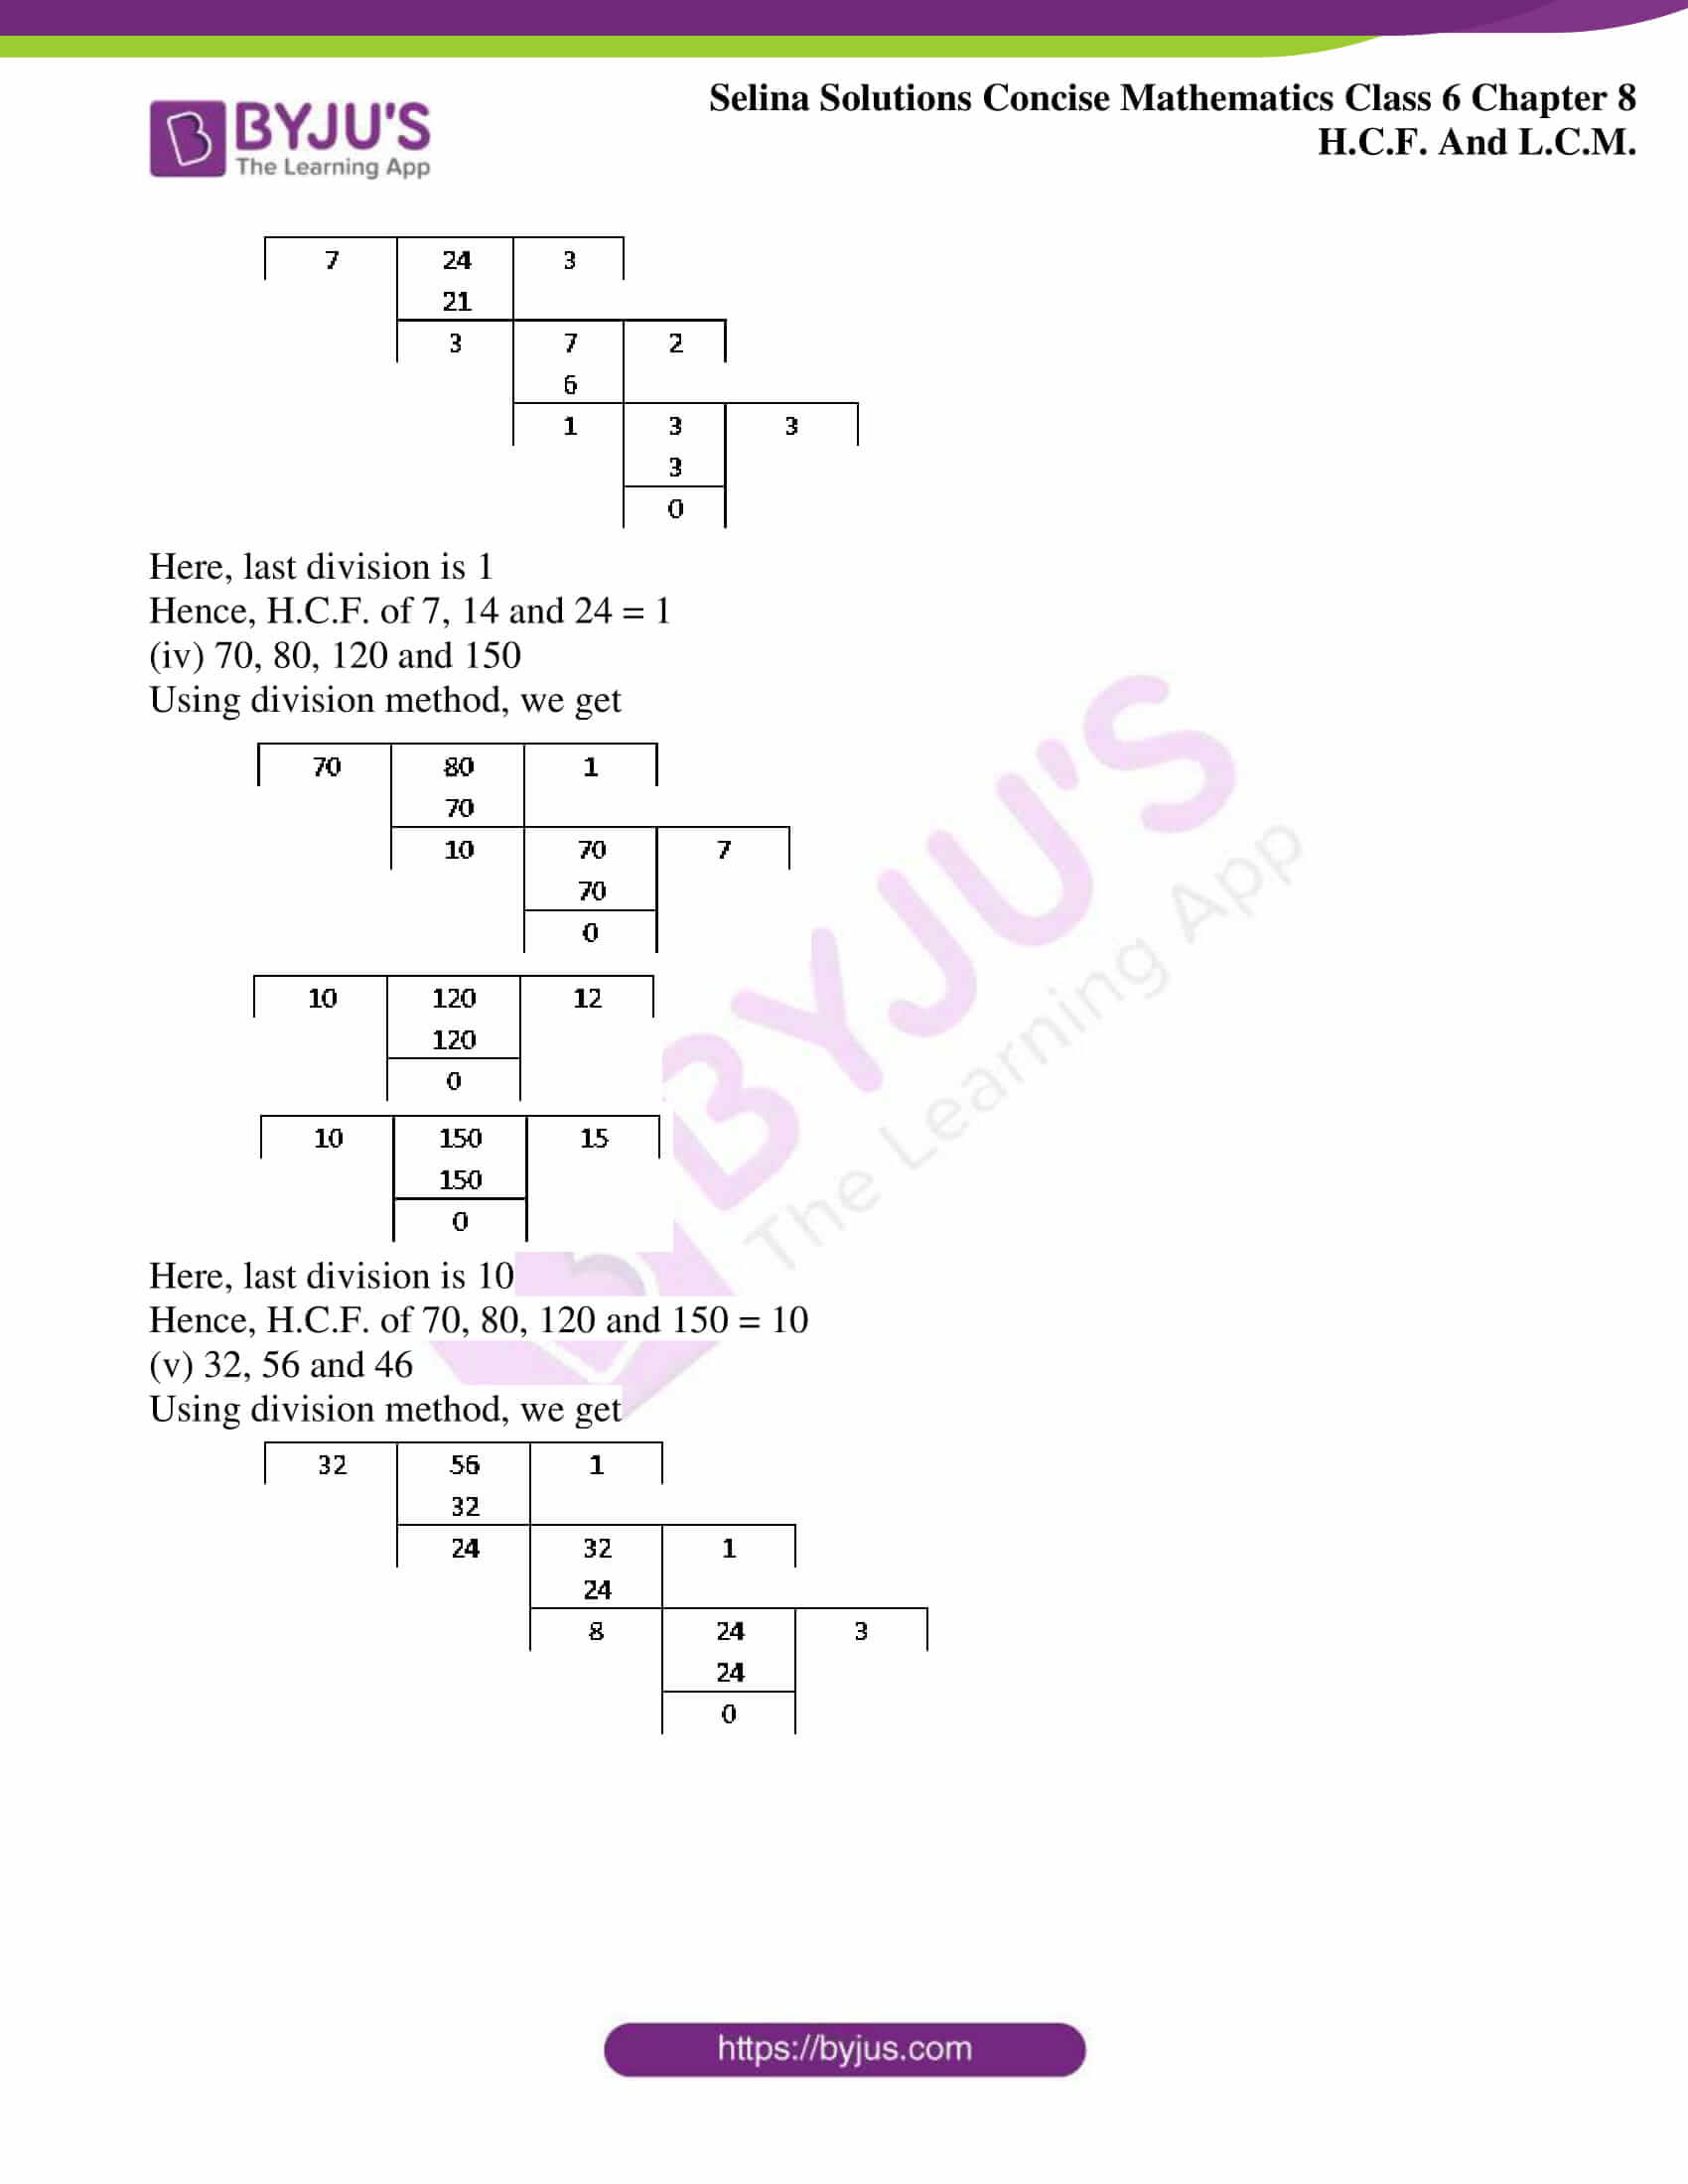 selina sol concise mathematics class 6 ch 8 ex b 4